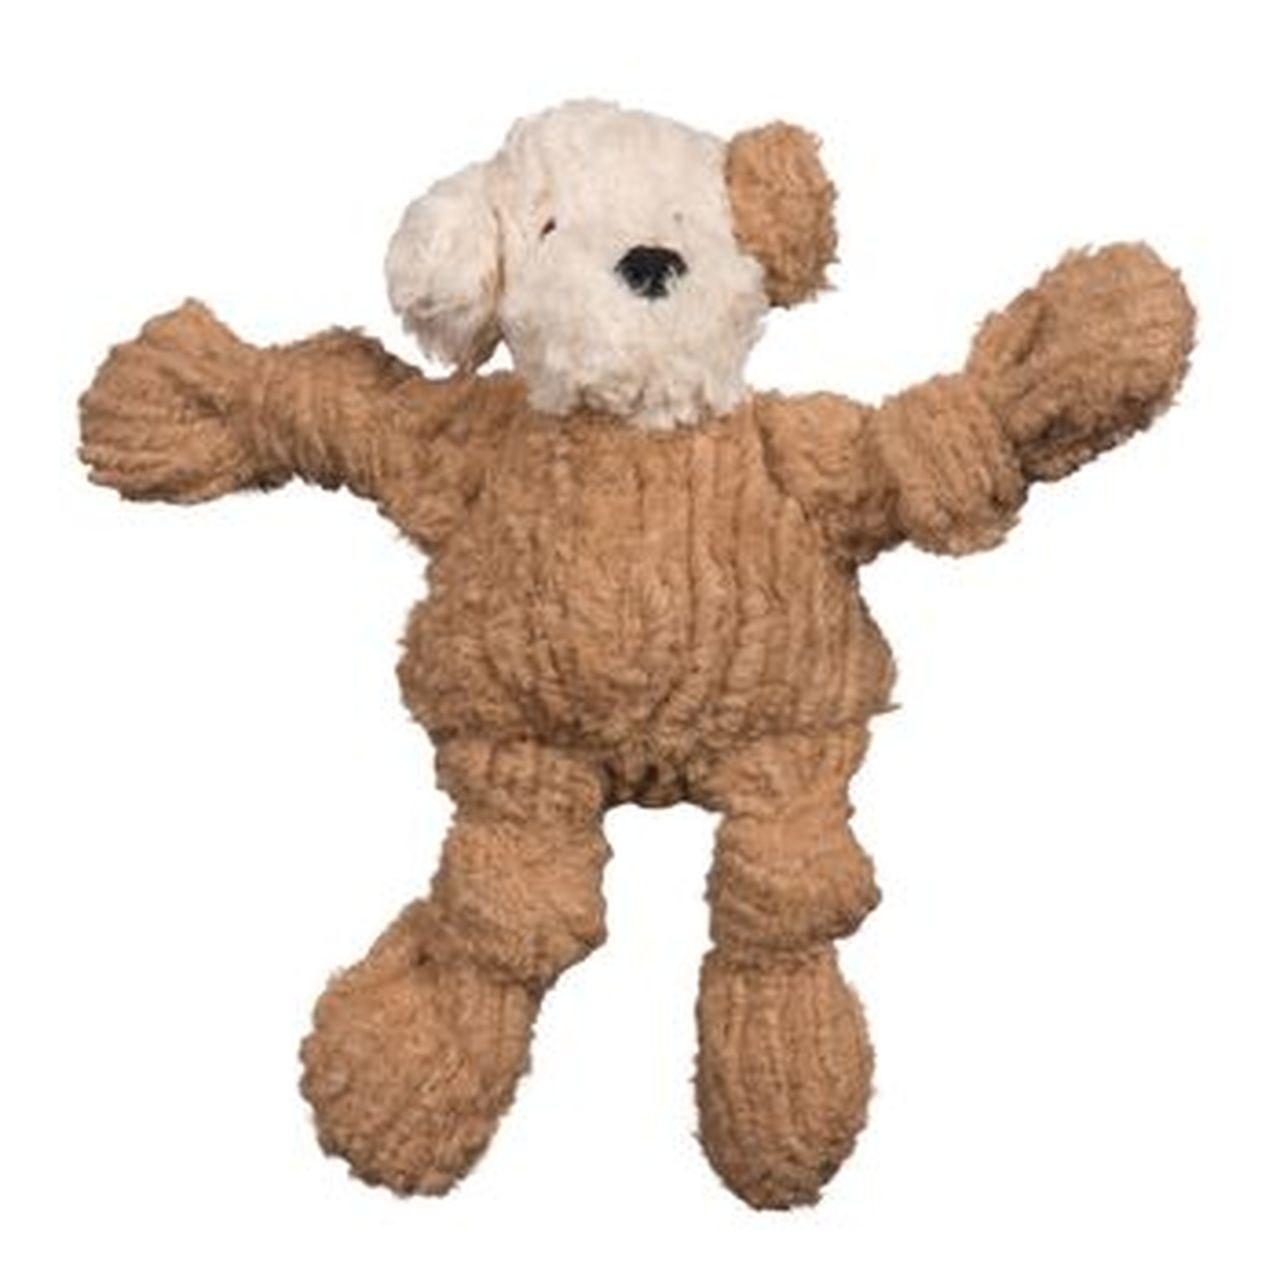 HuggleHounds Knottie HuggleMutt Lulu Dog Toy, Small